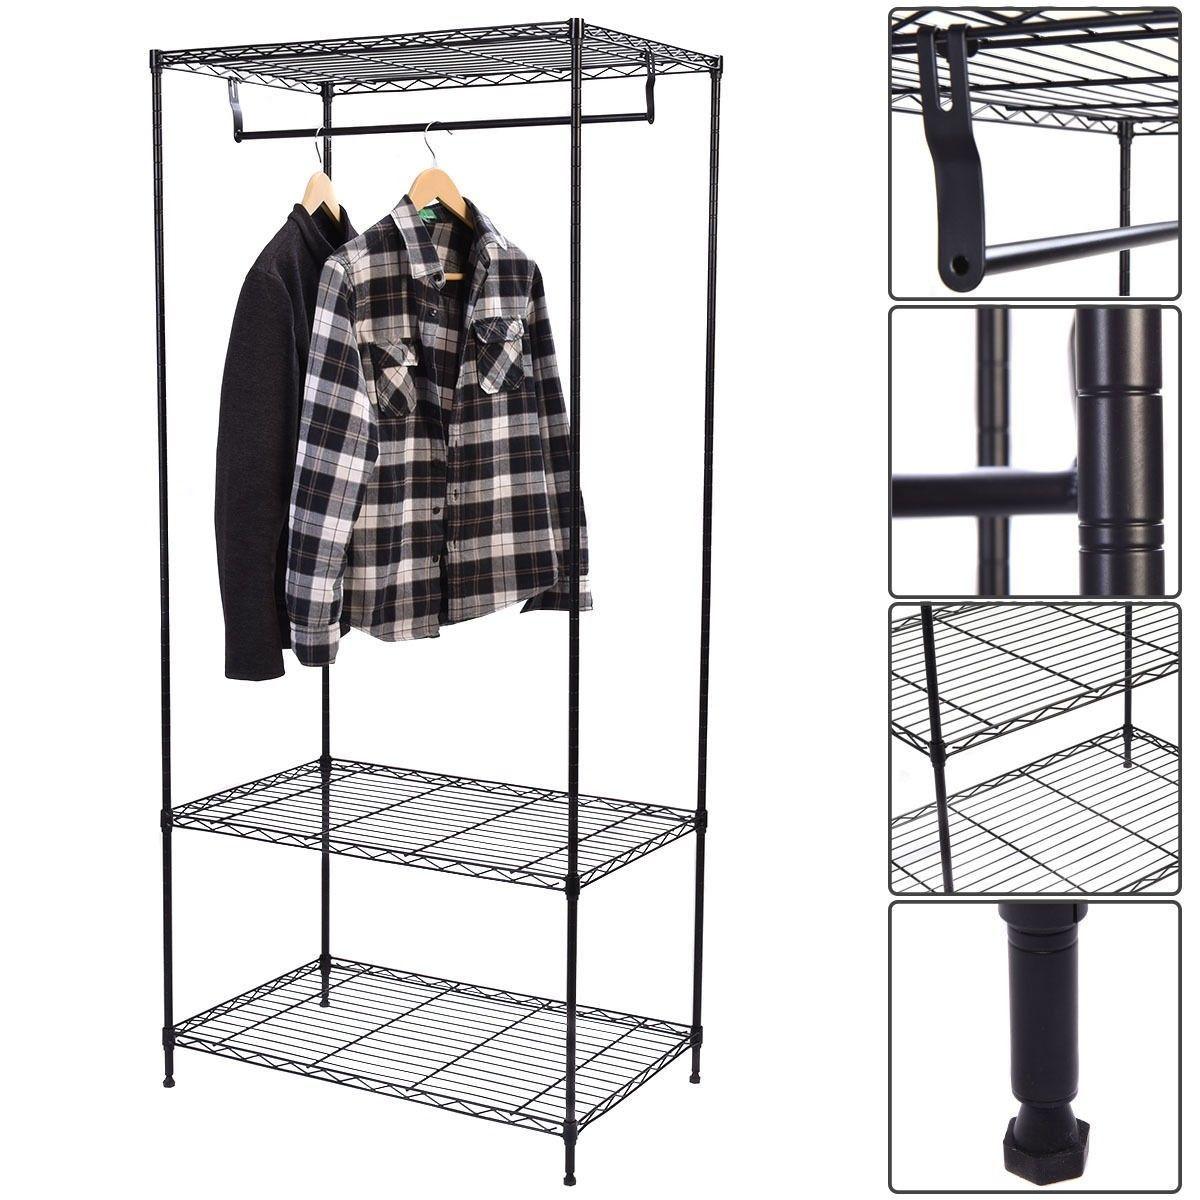 2018 Clothing Garment Rack Shelving Wire Shelf Dress Portable ...